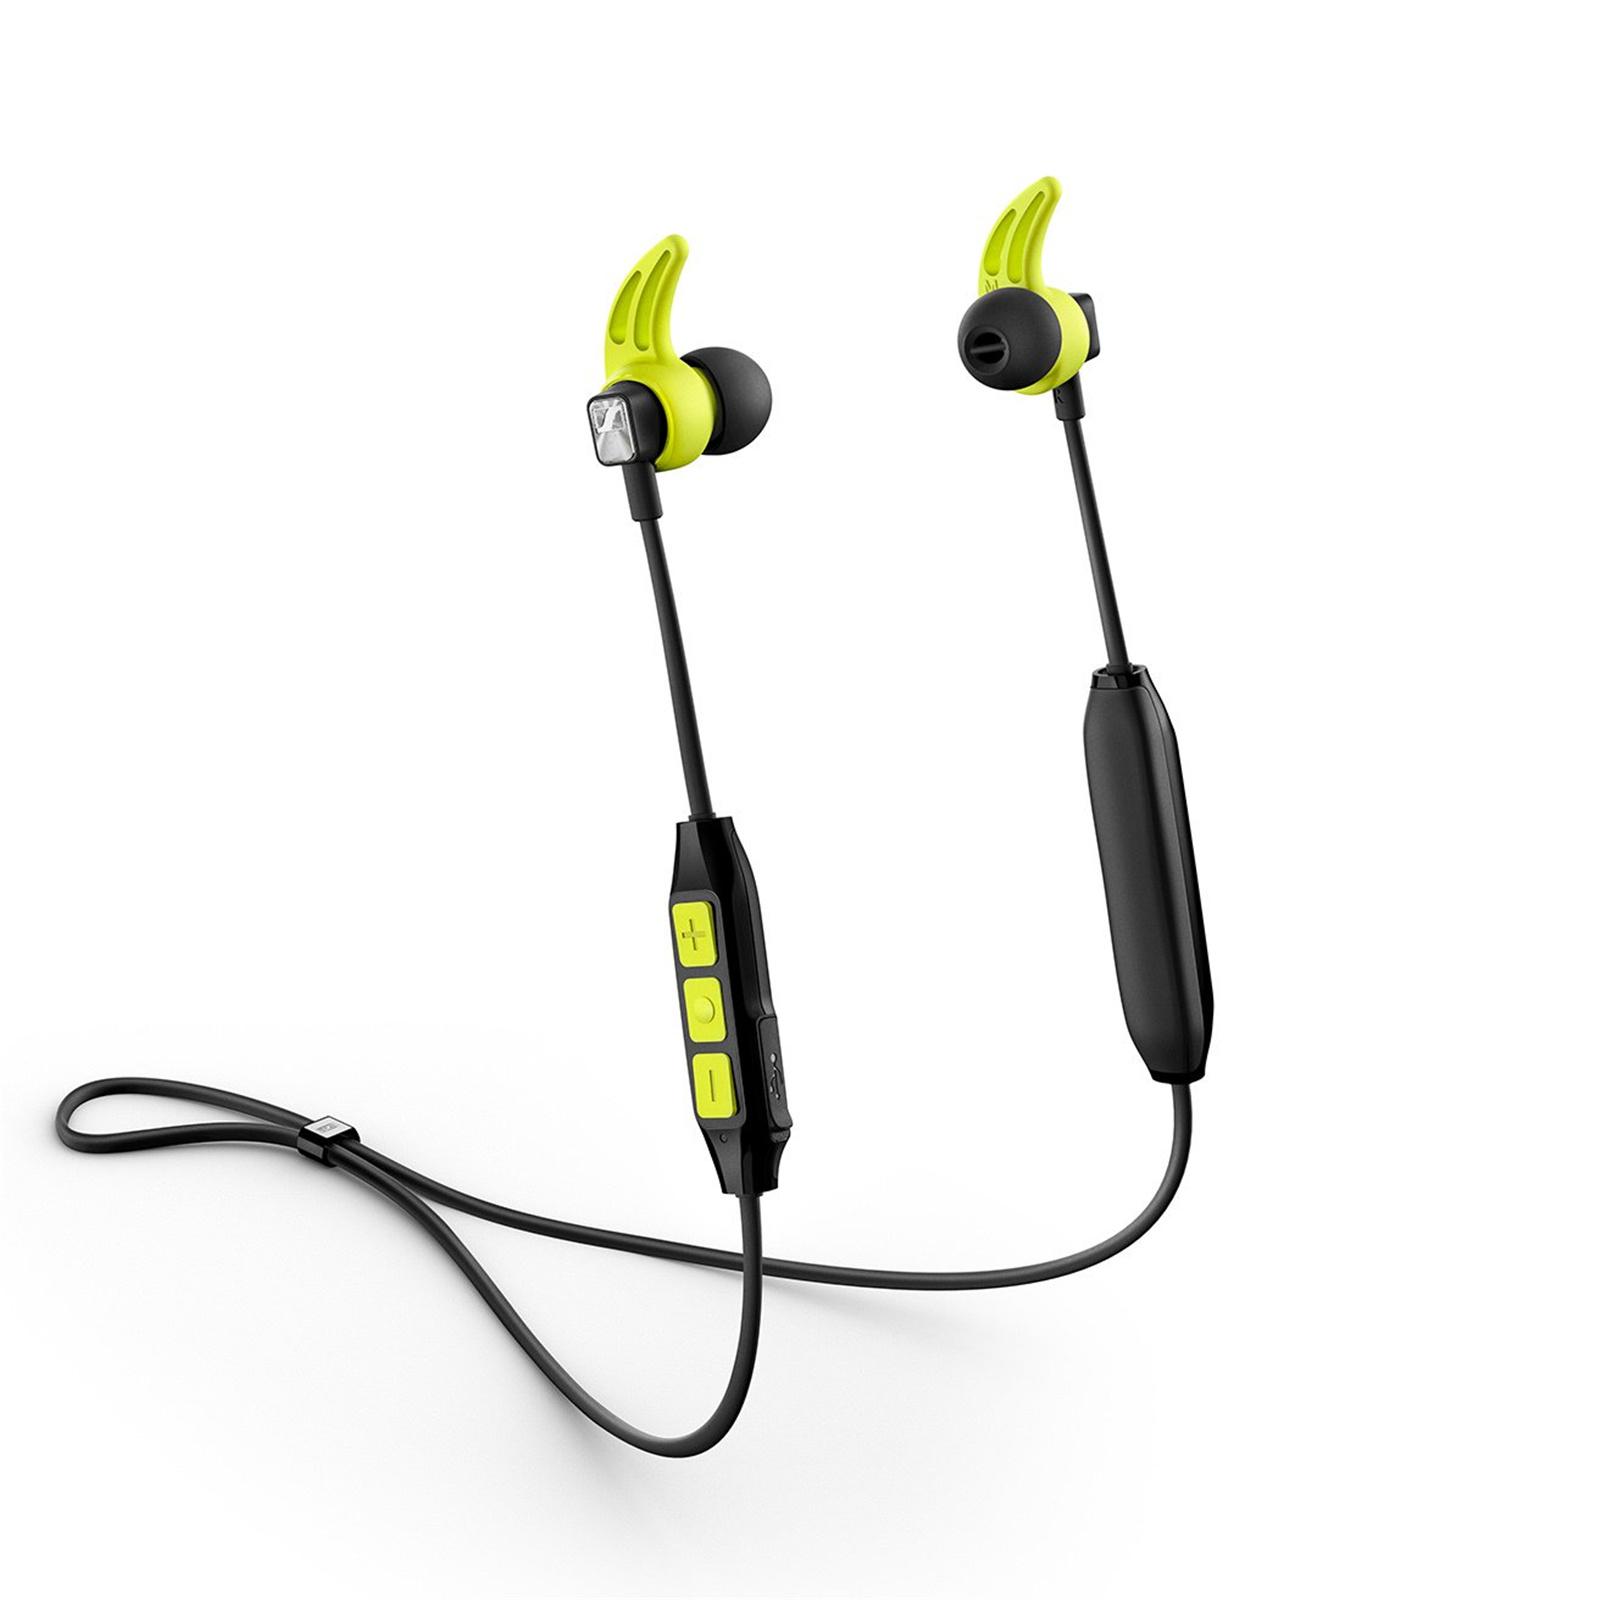 aa7cd2532bc Sennheiser CX SPORT Wireless Earphones - Black/Yellow - Lightweight sweat &  splash-resistant design, 6 hour battery life, AptX & AptX Low Latency, ...